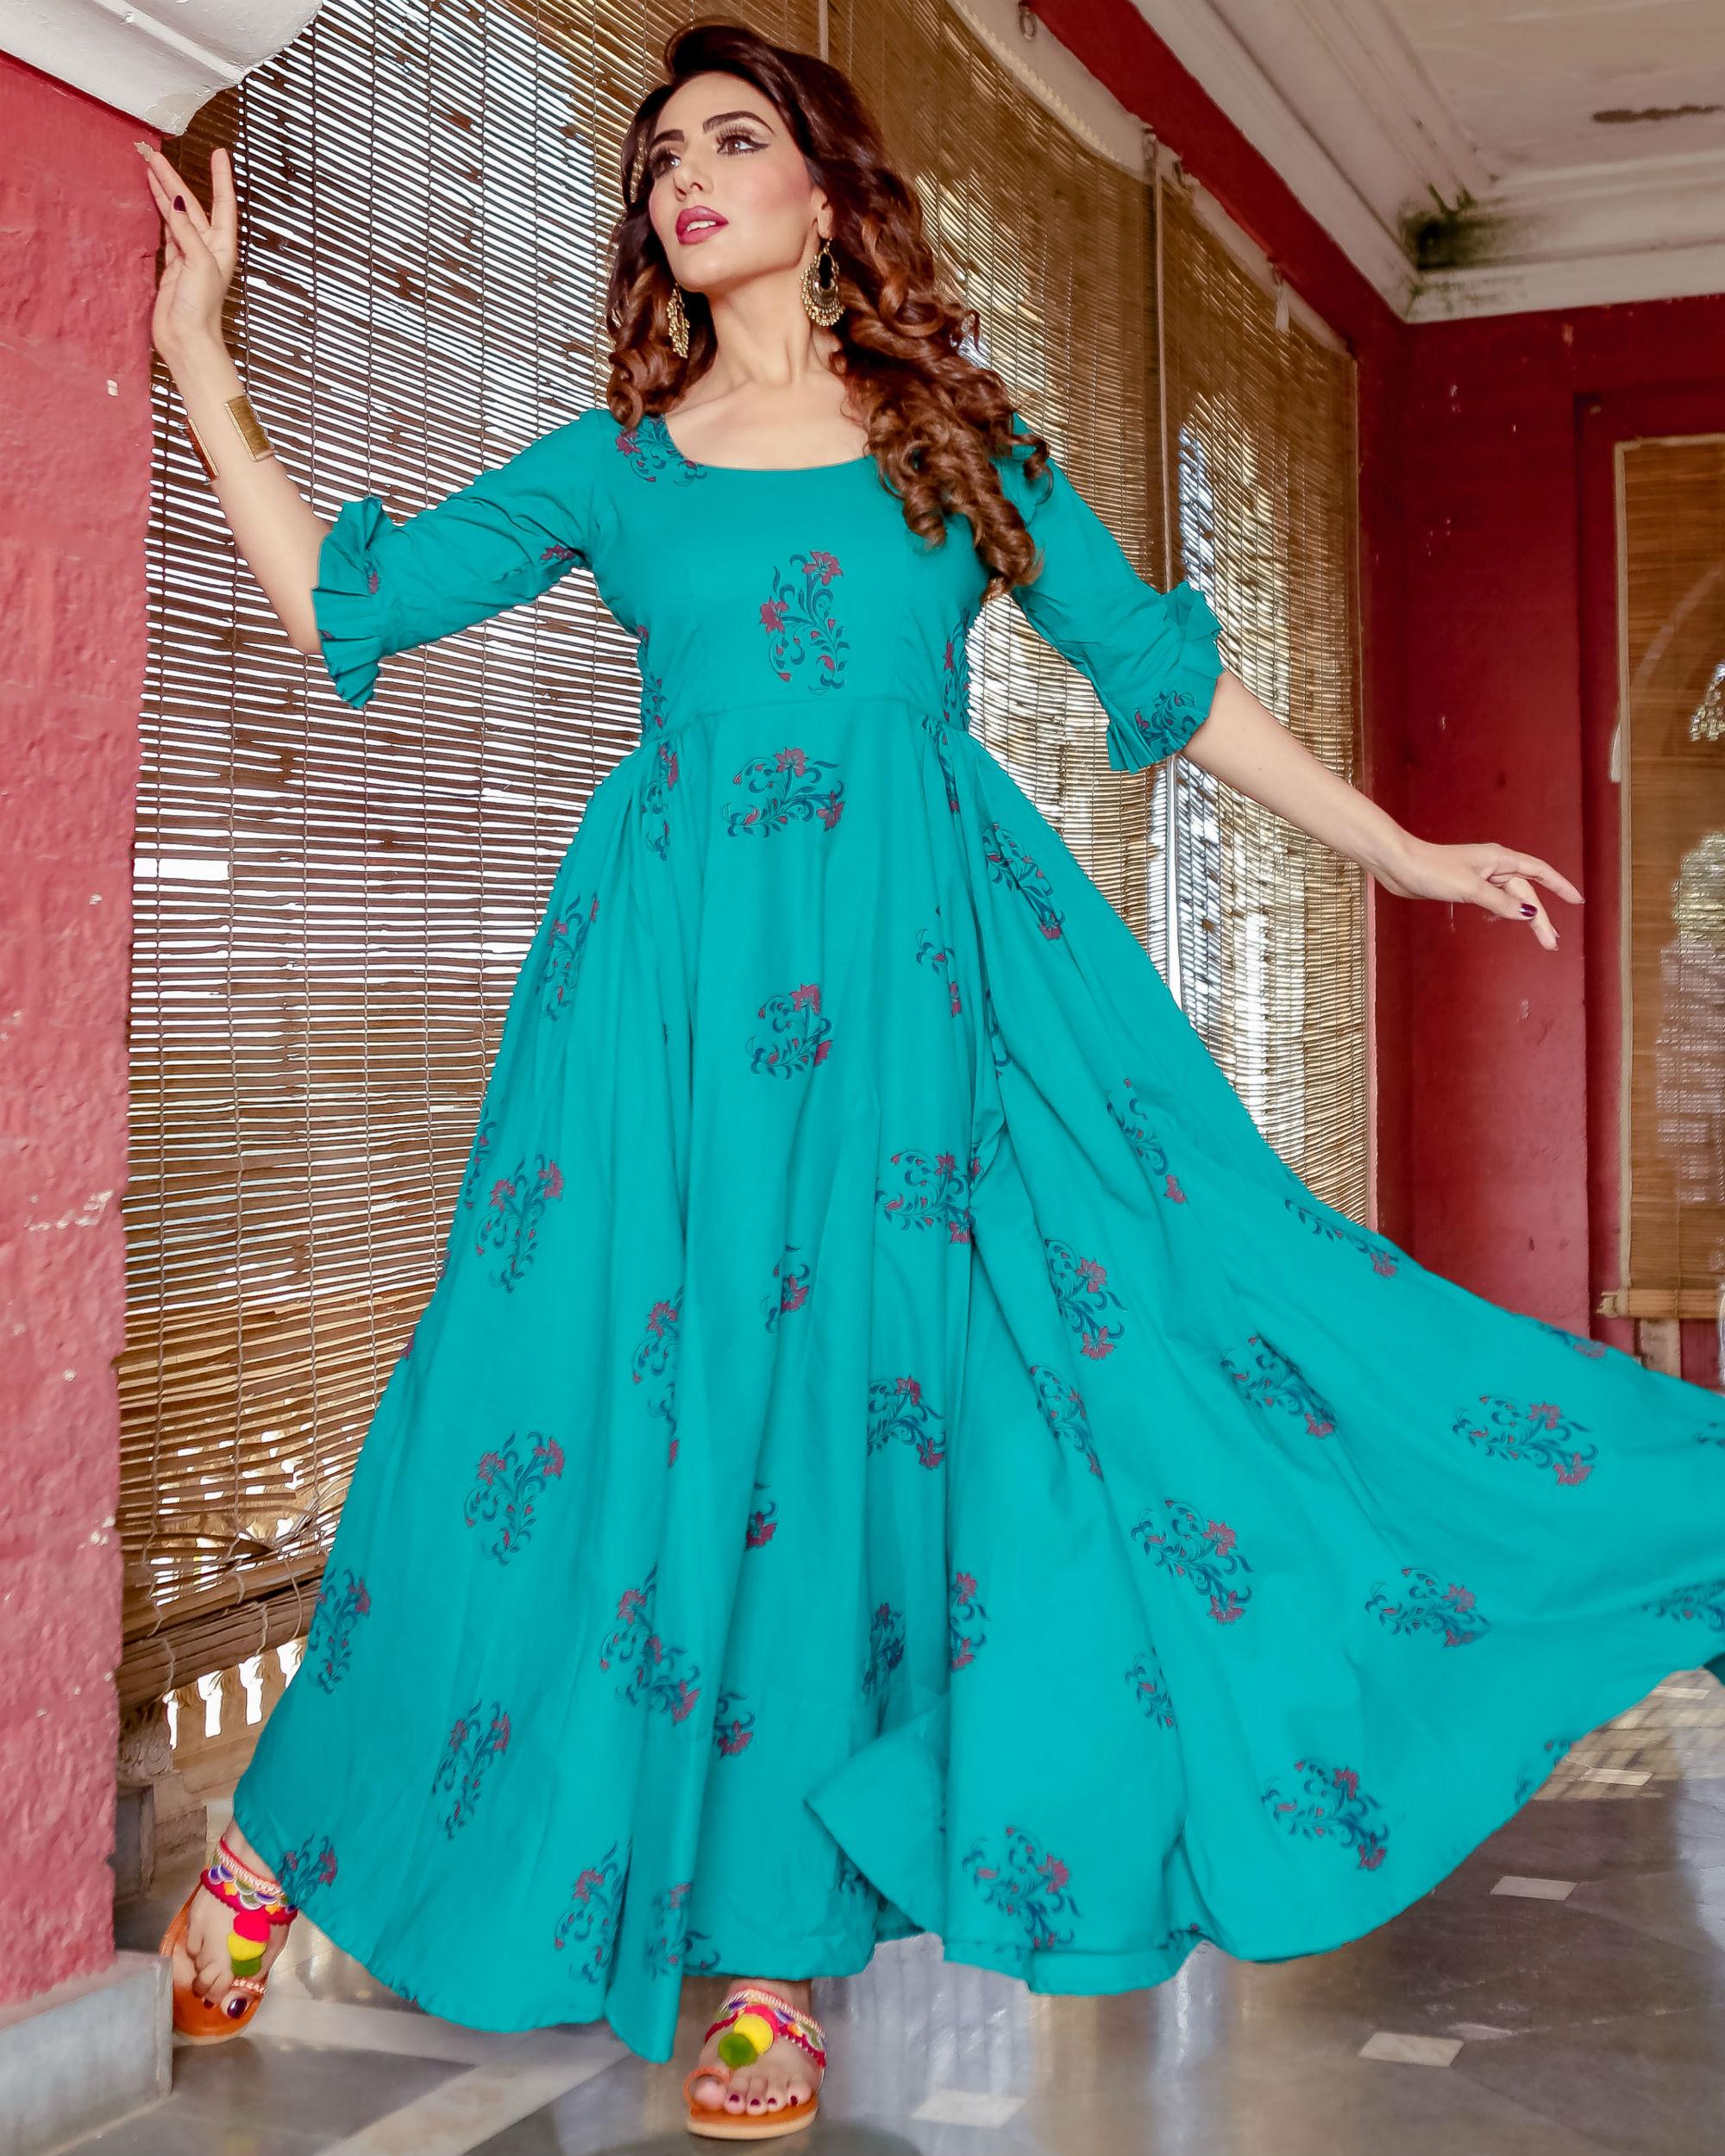 Sea blue hand printed dress